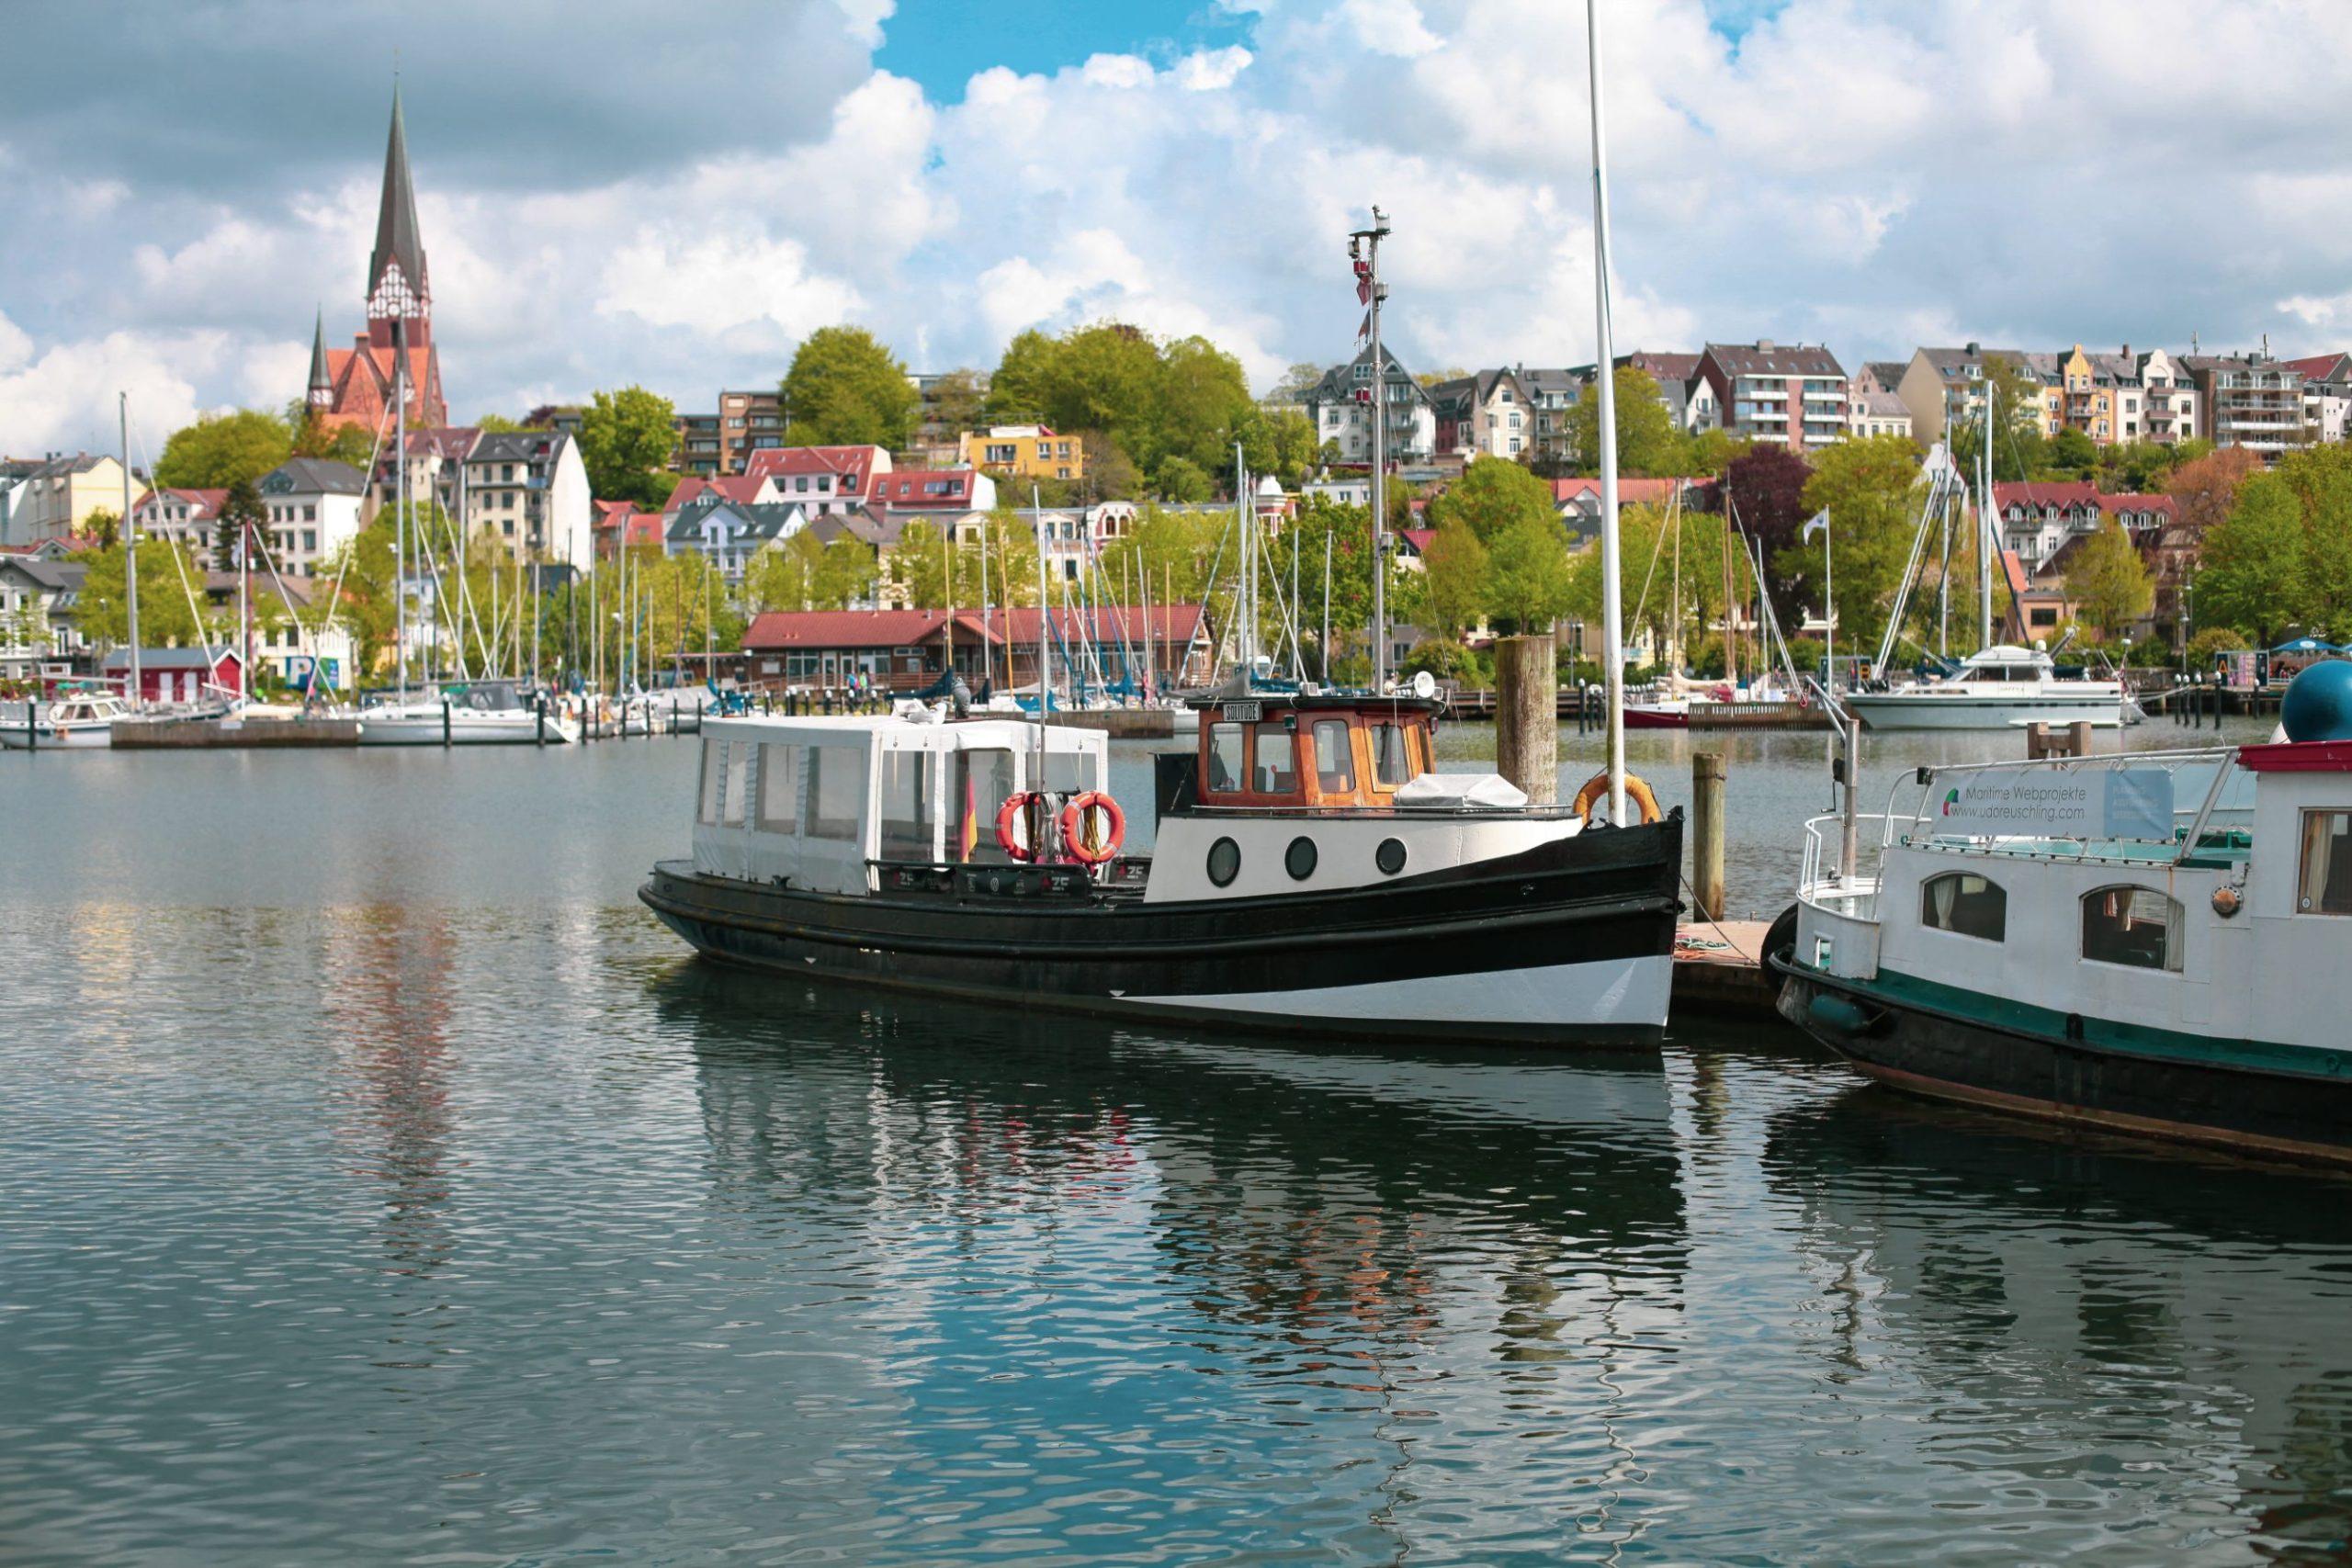 Flensburger Hafen - pxfuel.com